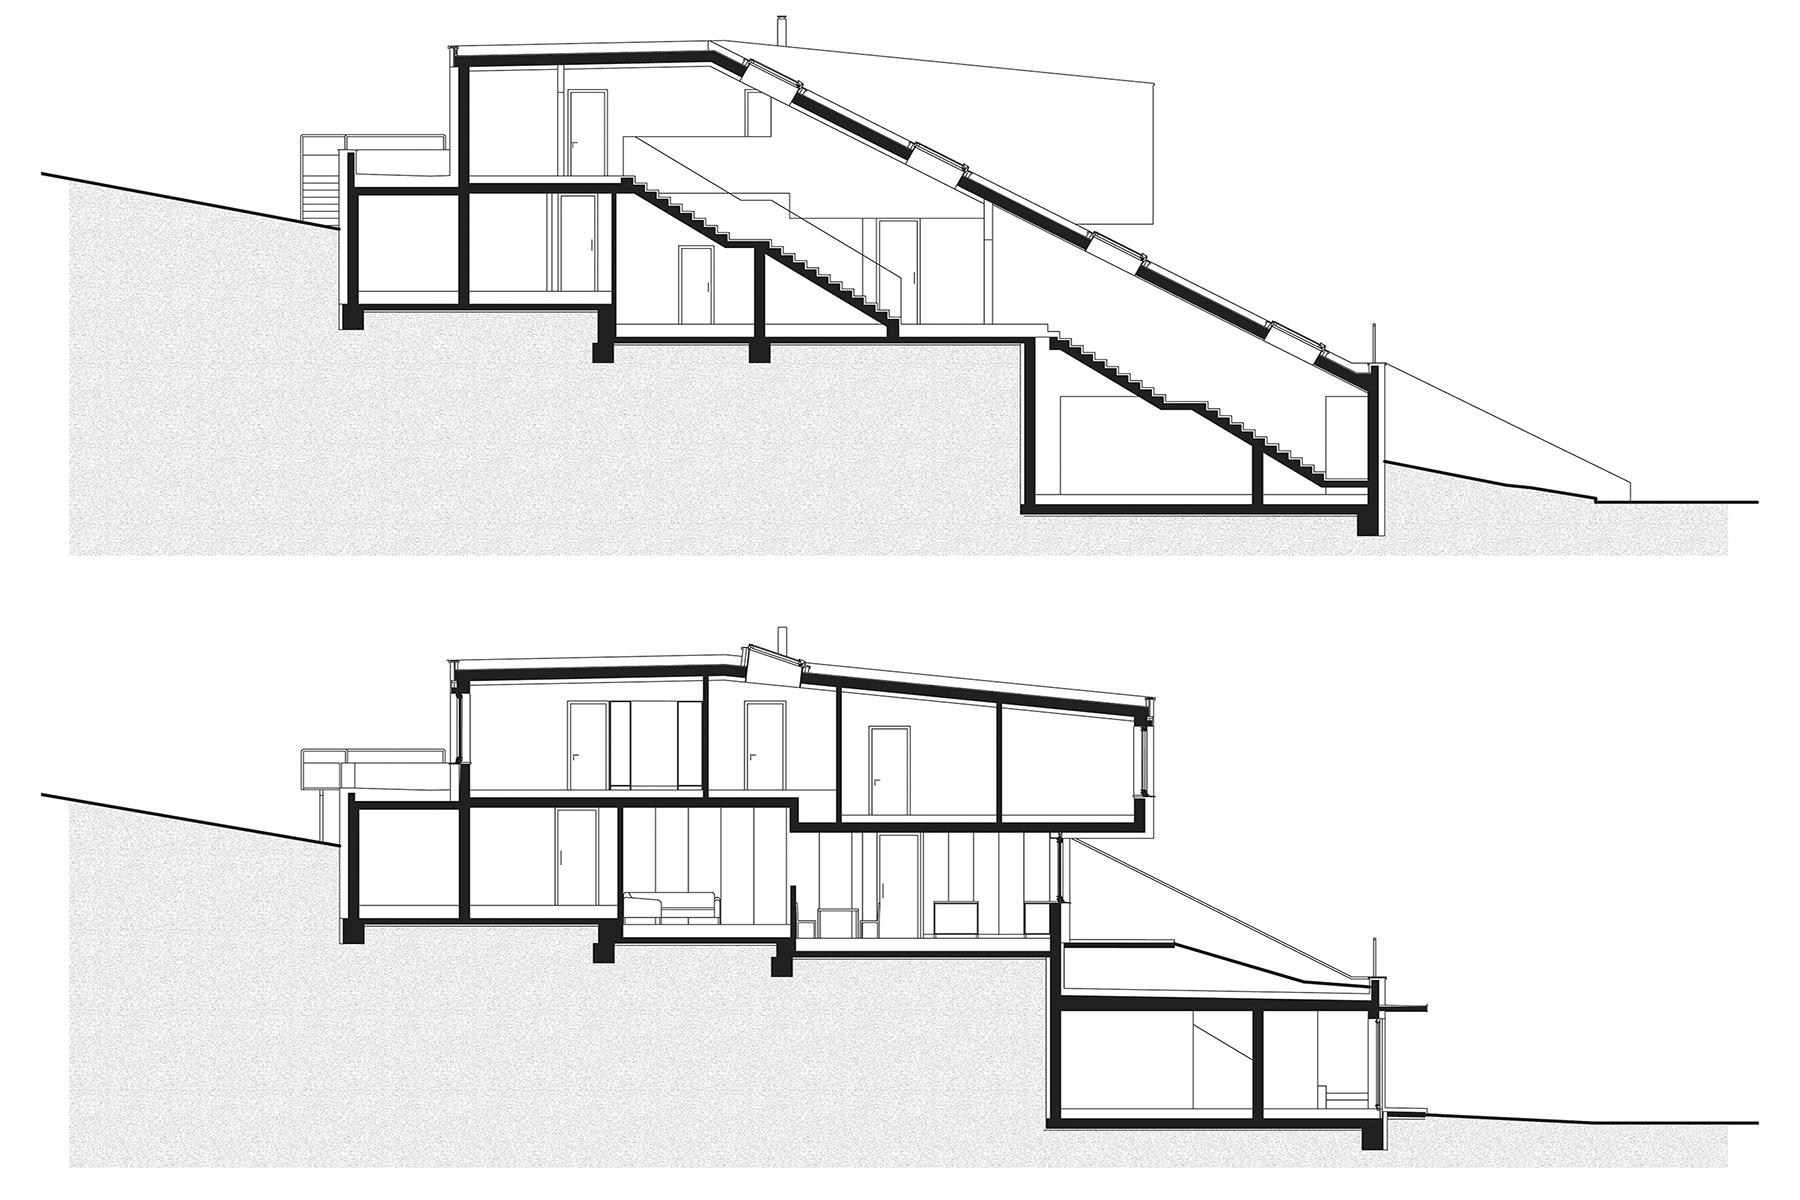 Schnitt, Haus am Berg, architekt, hanghaus, haus am hang, architektur, architektenhaus, gramastetten